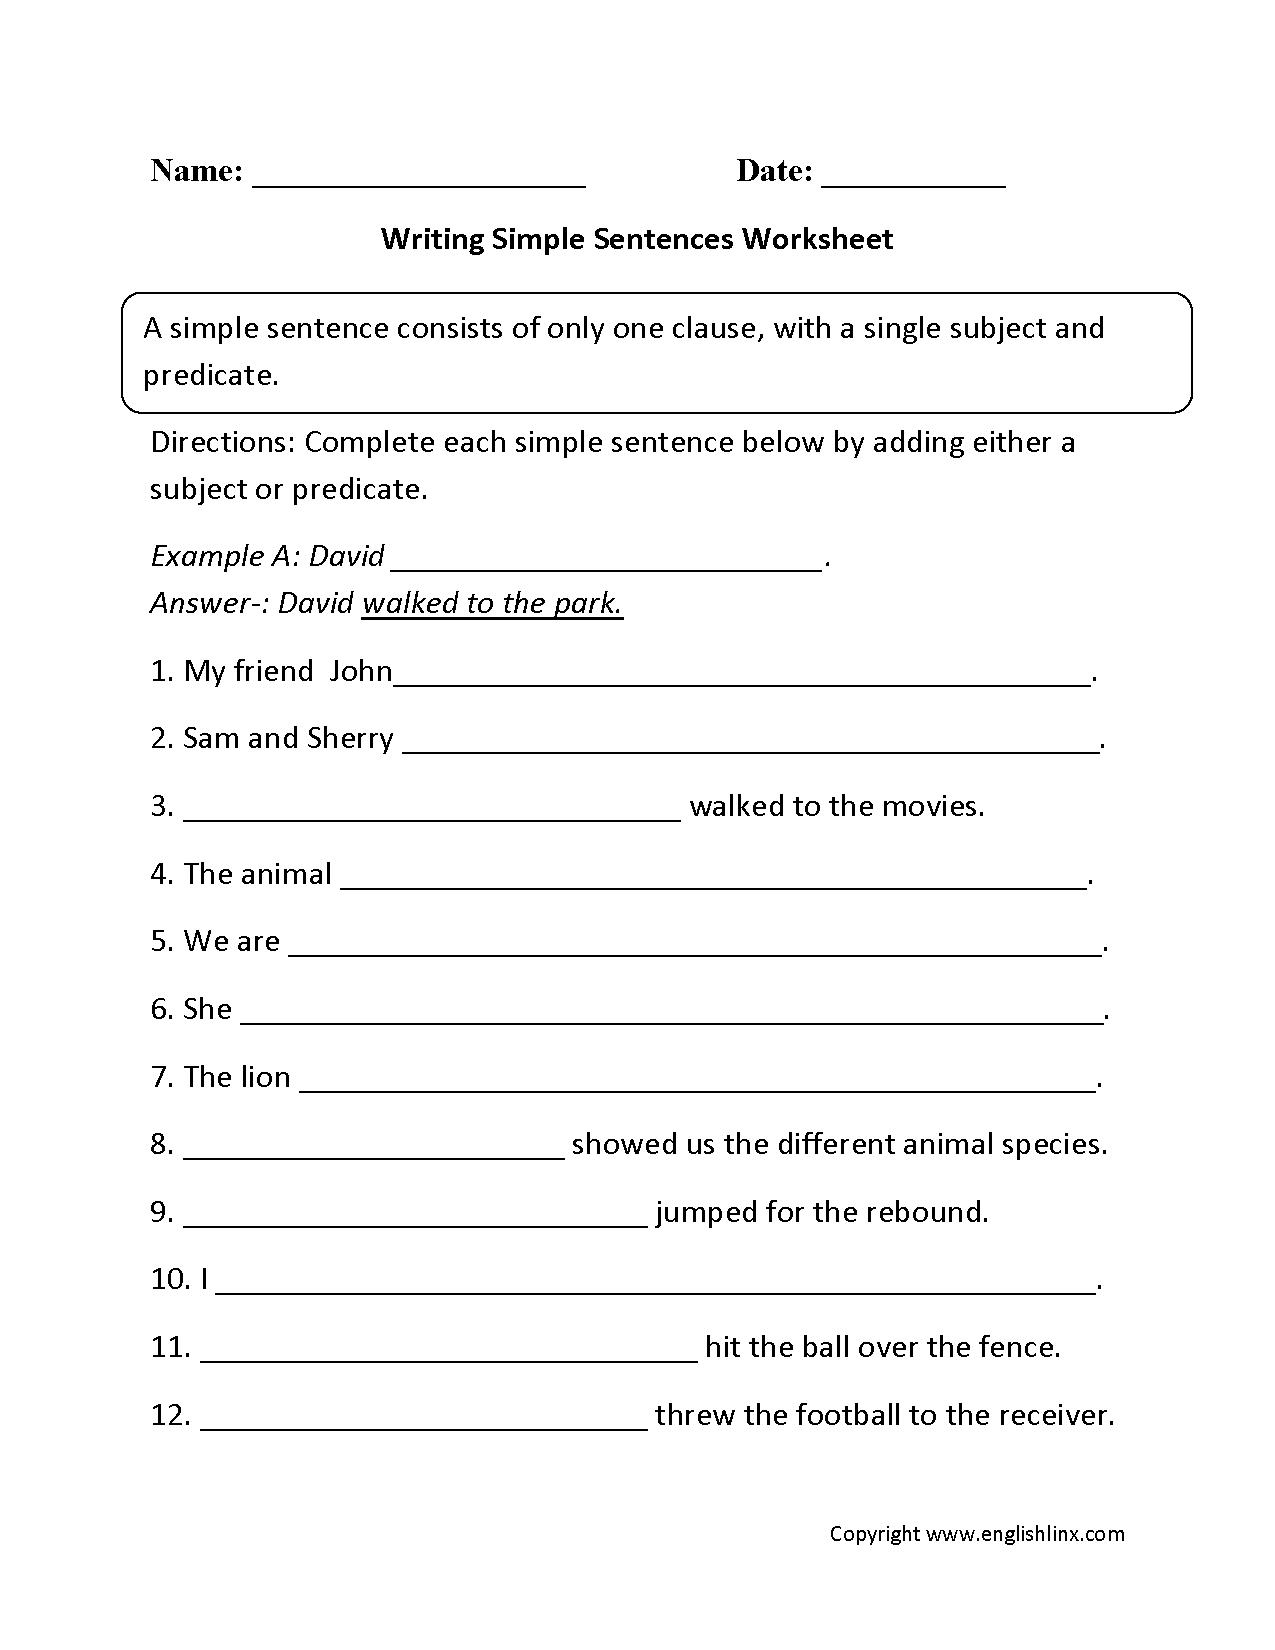 Writing Sentences Worksheets